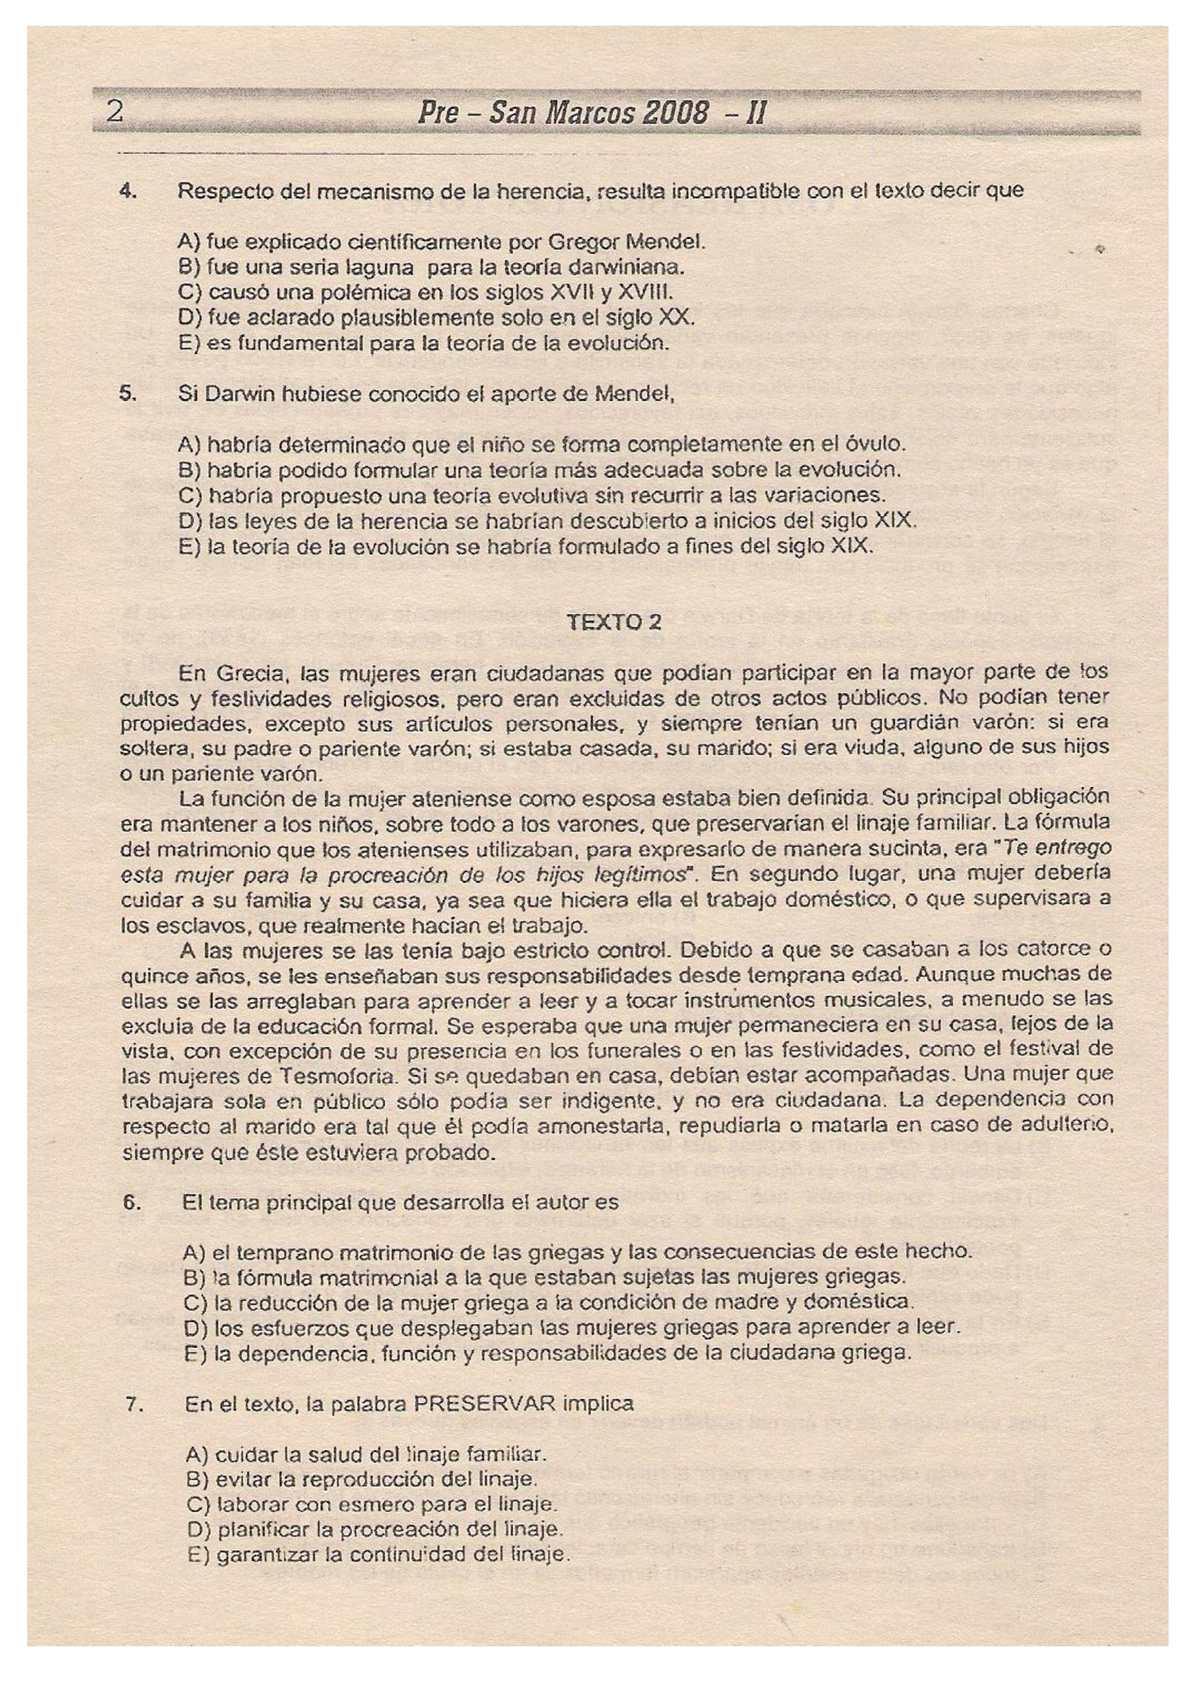 1er. Examen Pre San Marcos 2008-II - CALAMEO Downloader